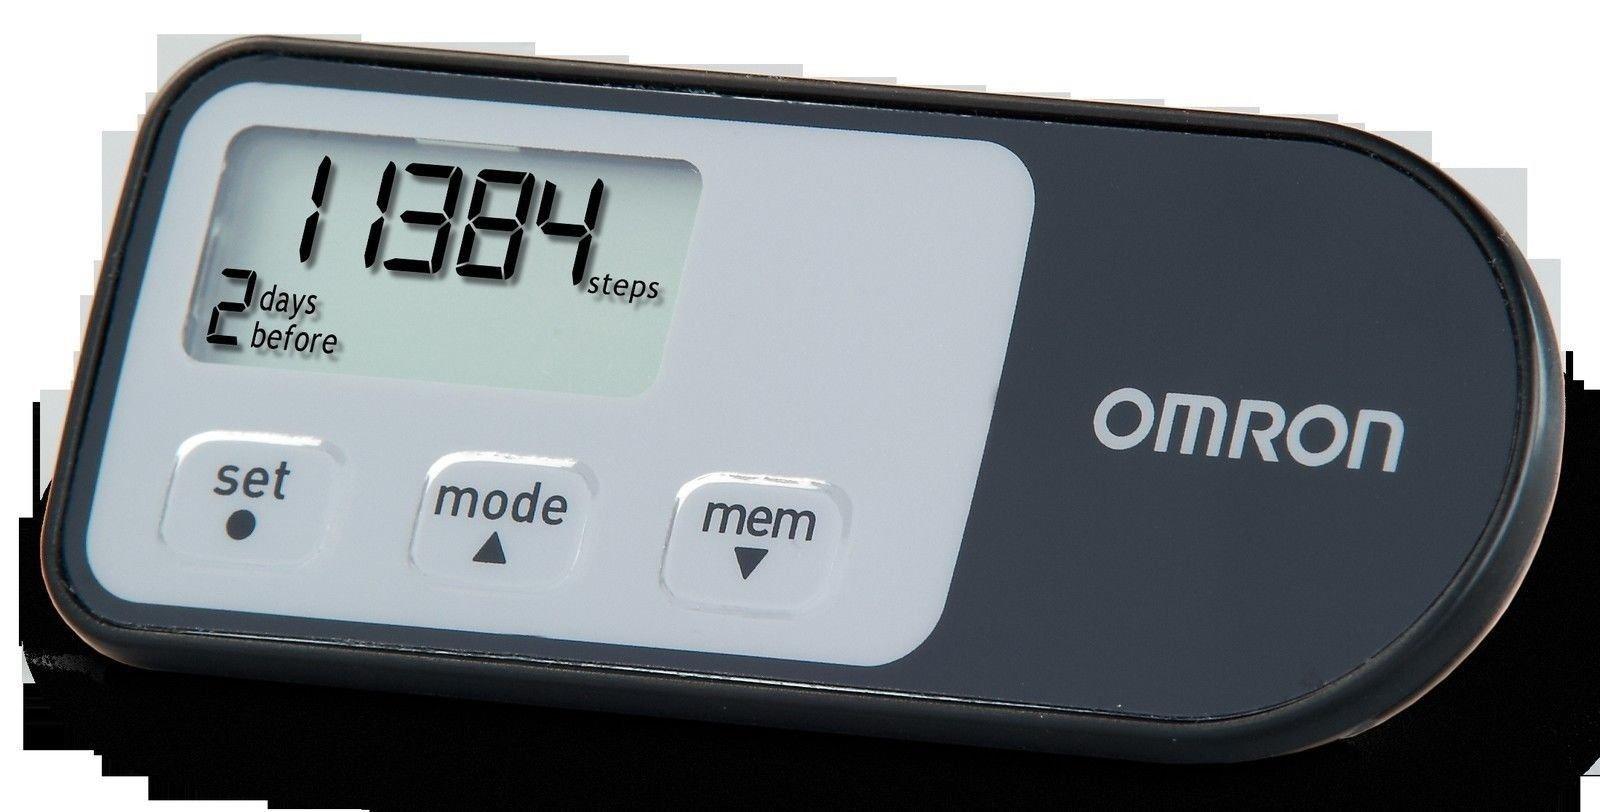 Omron HJ-323 Alvita USB Pedometer